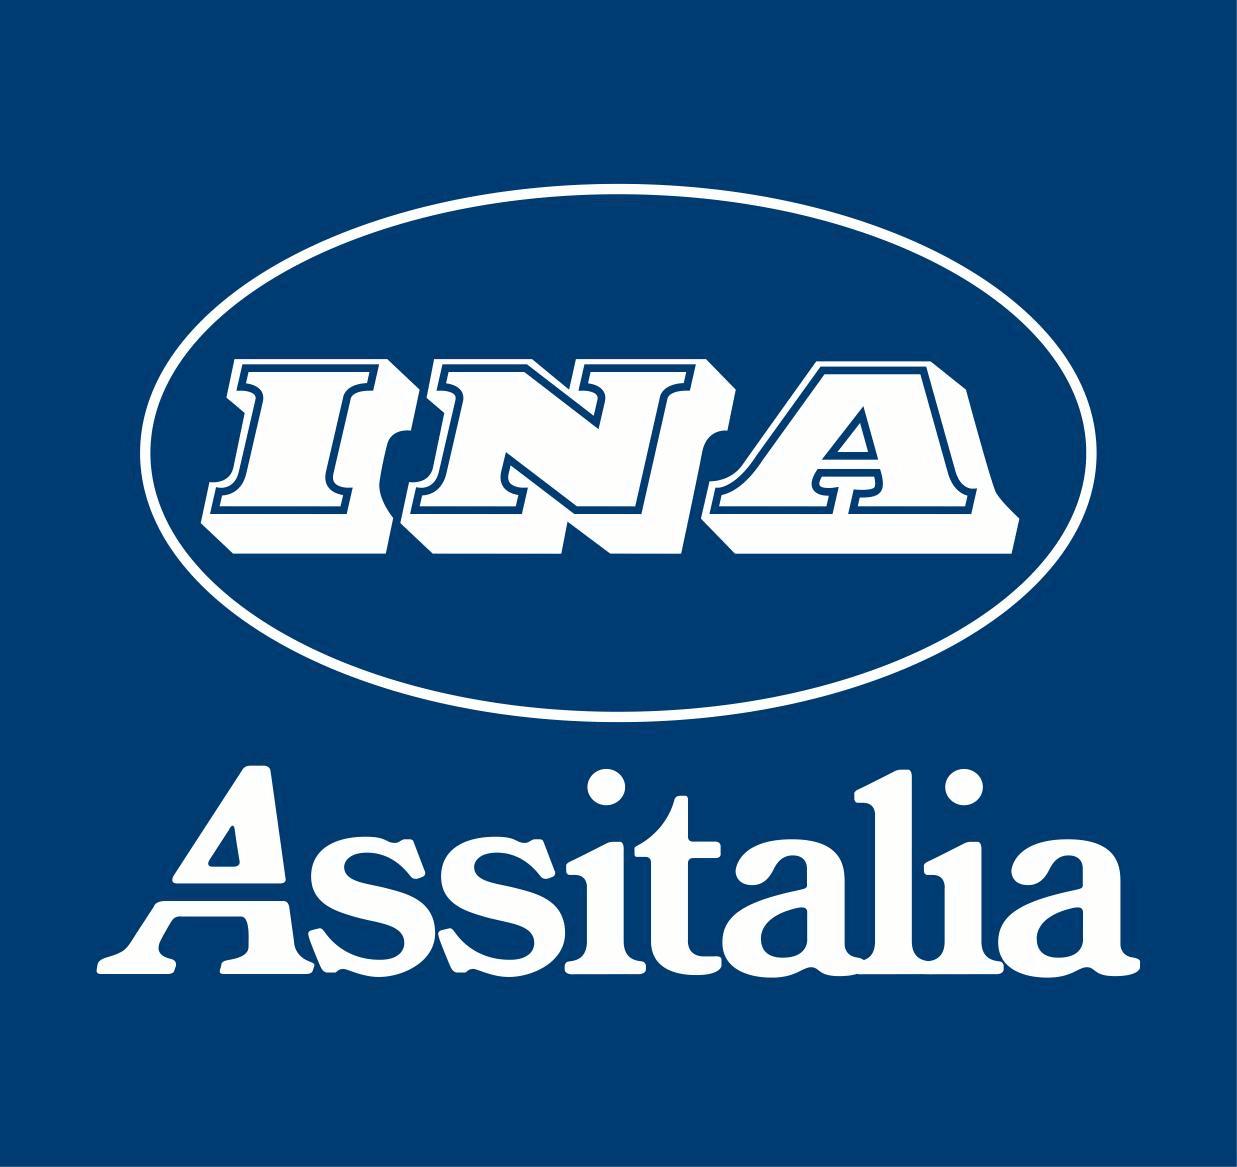 ina assitalia - wikipedia